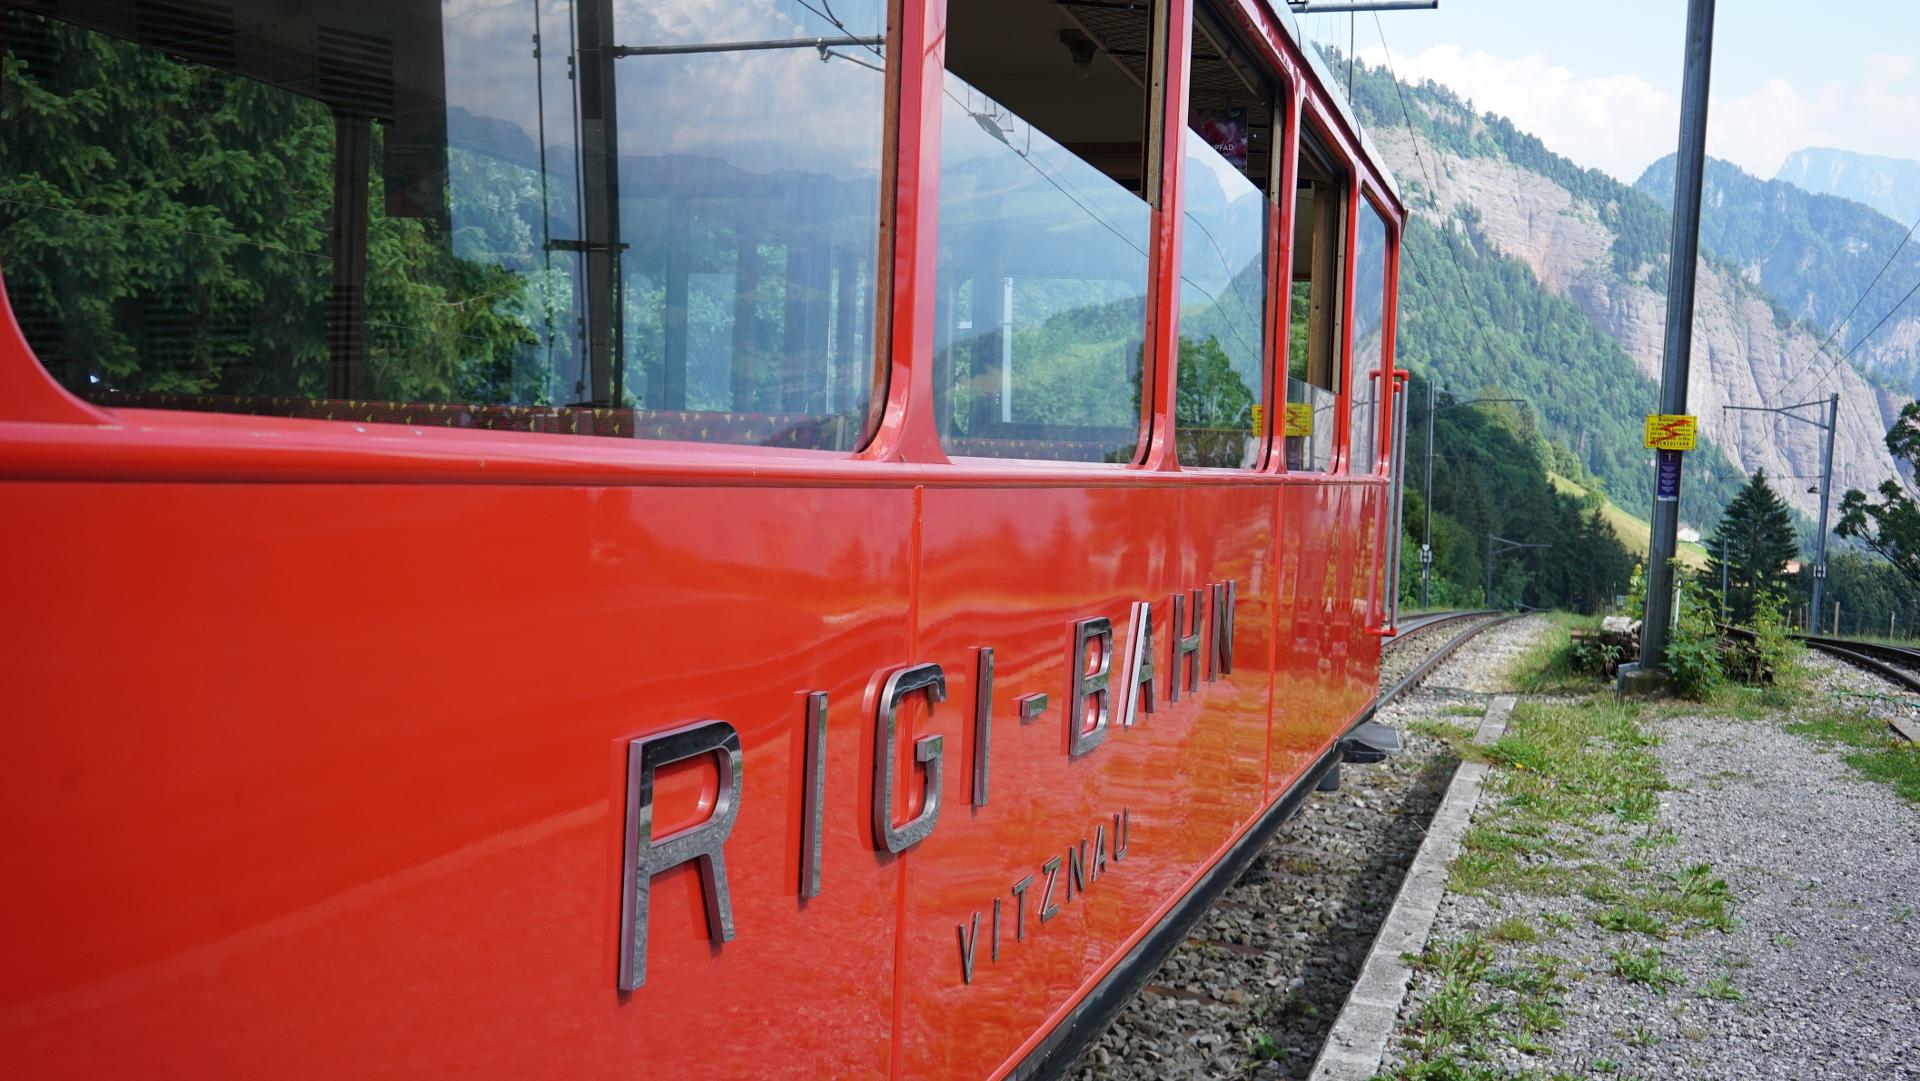 Rigibahn an der Station Romiti | © Vera Rüttimann